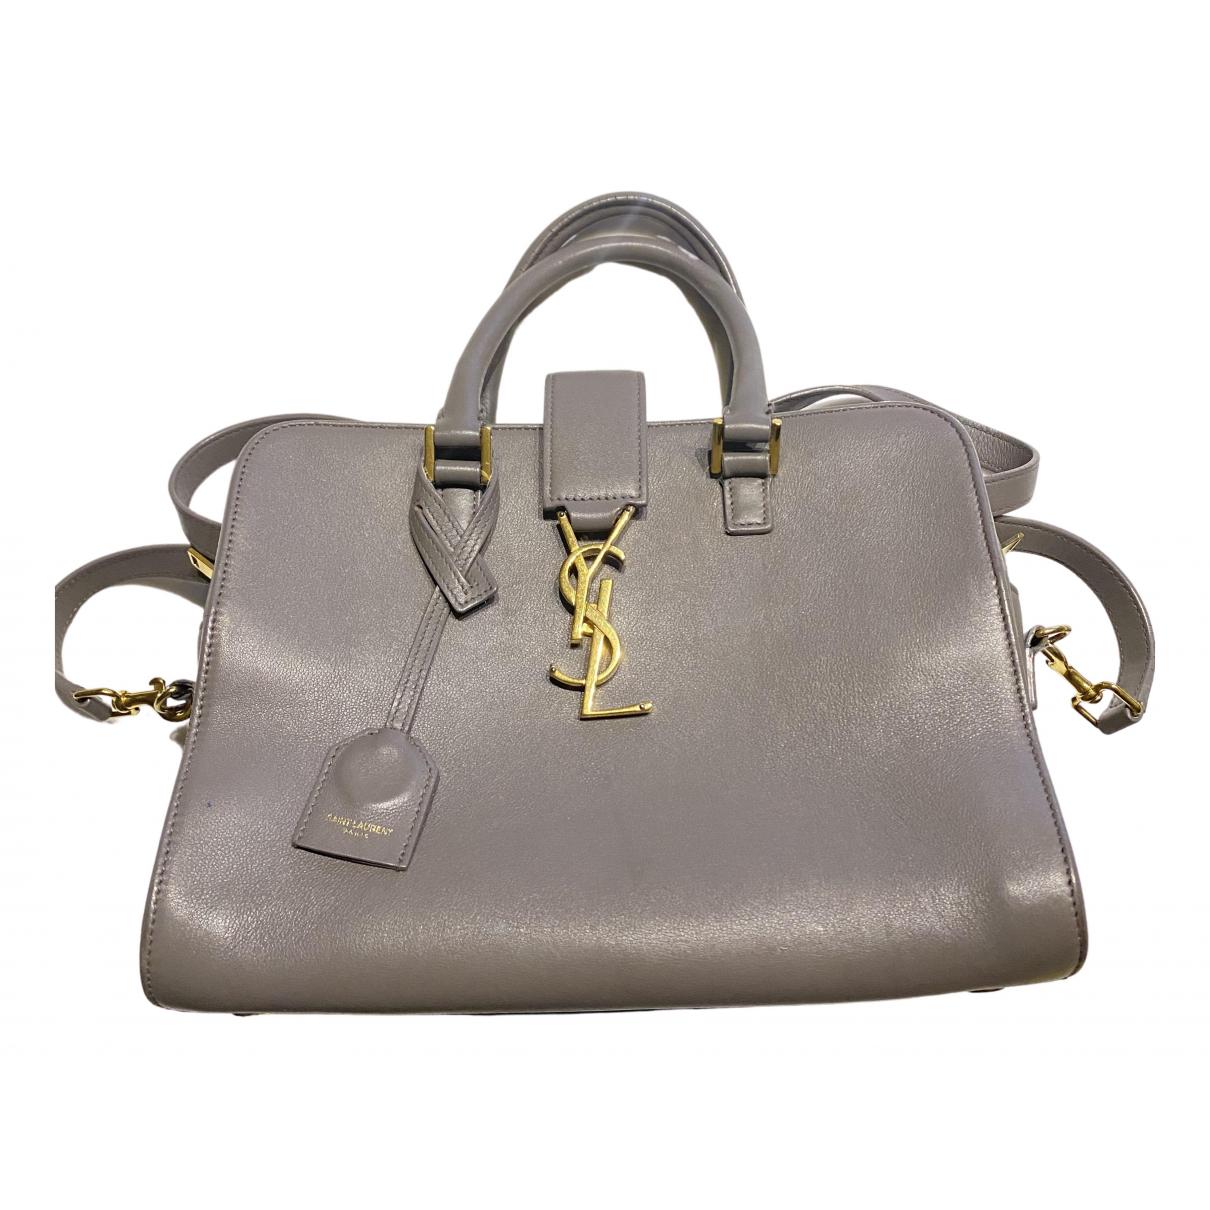 Saint Laurent Monogram Cabas Grey Leather handbag for Women N